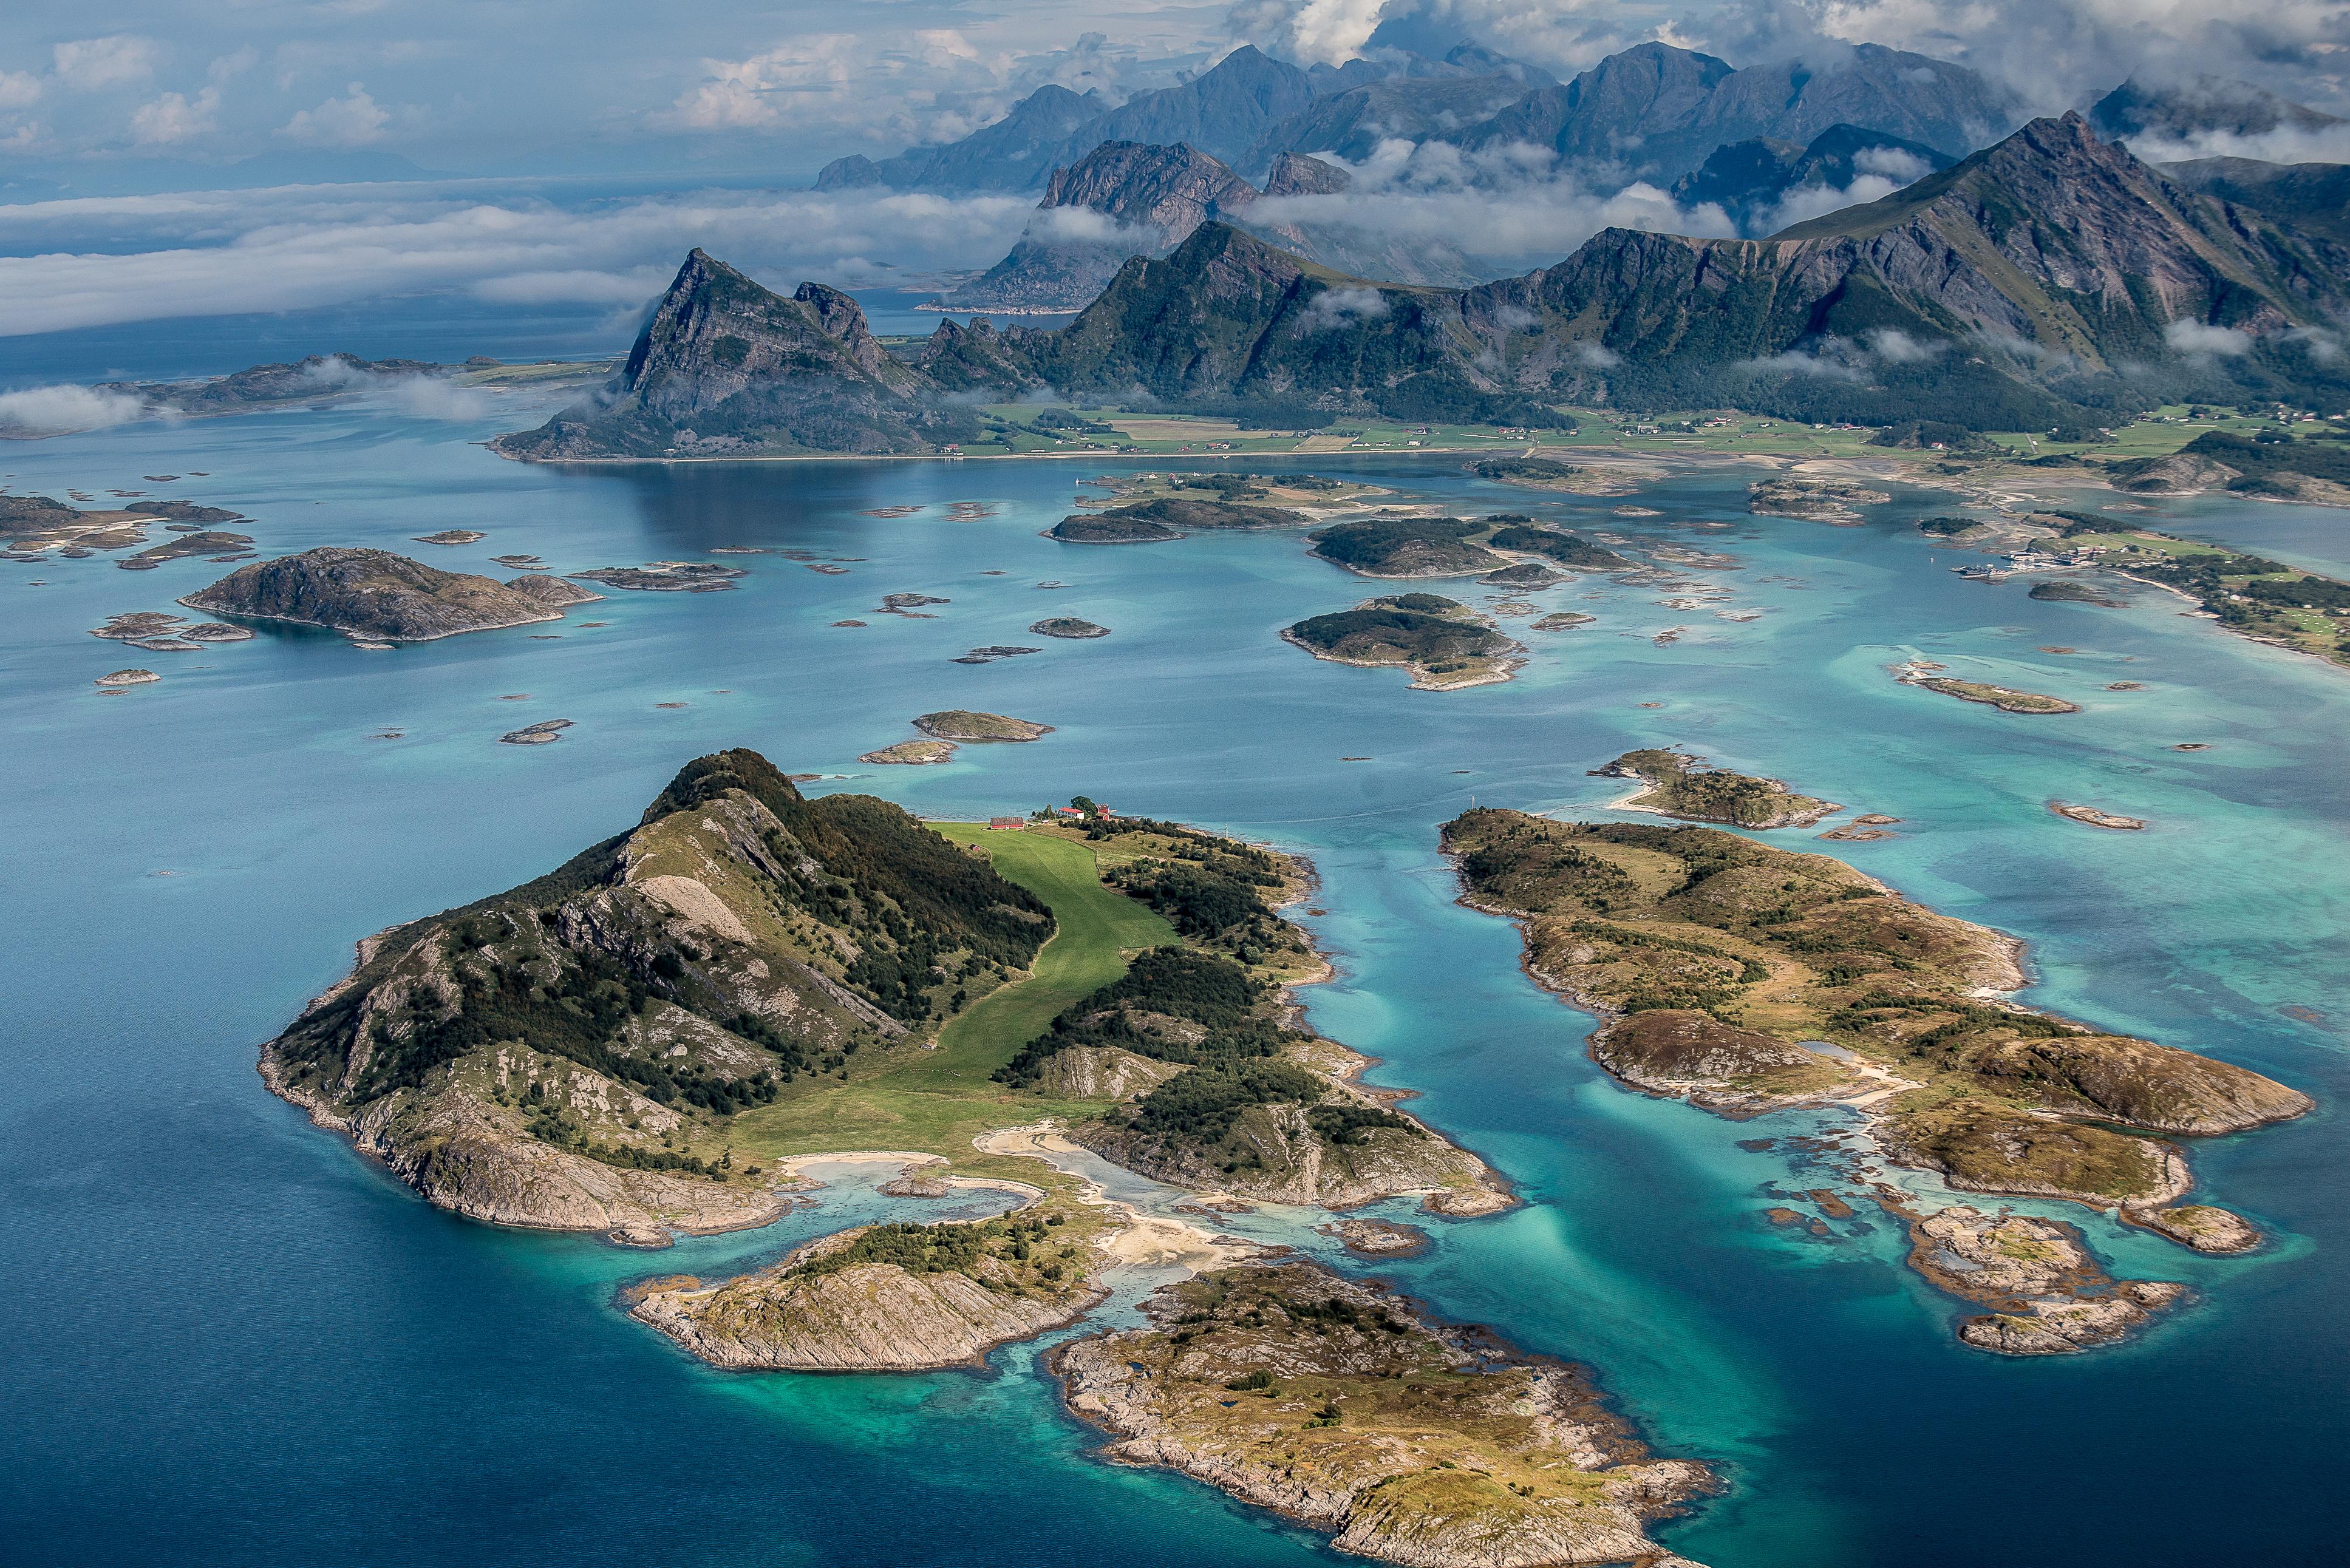 Løvøya